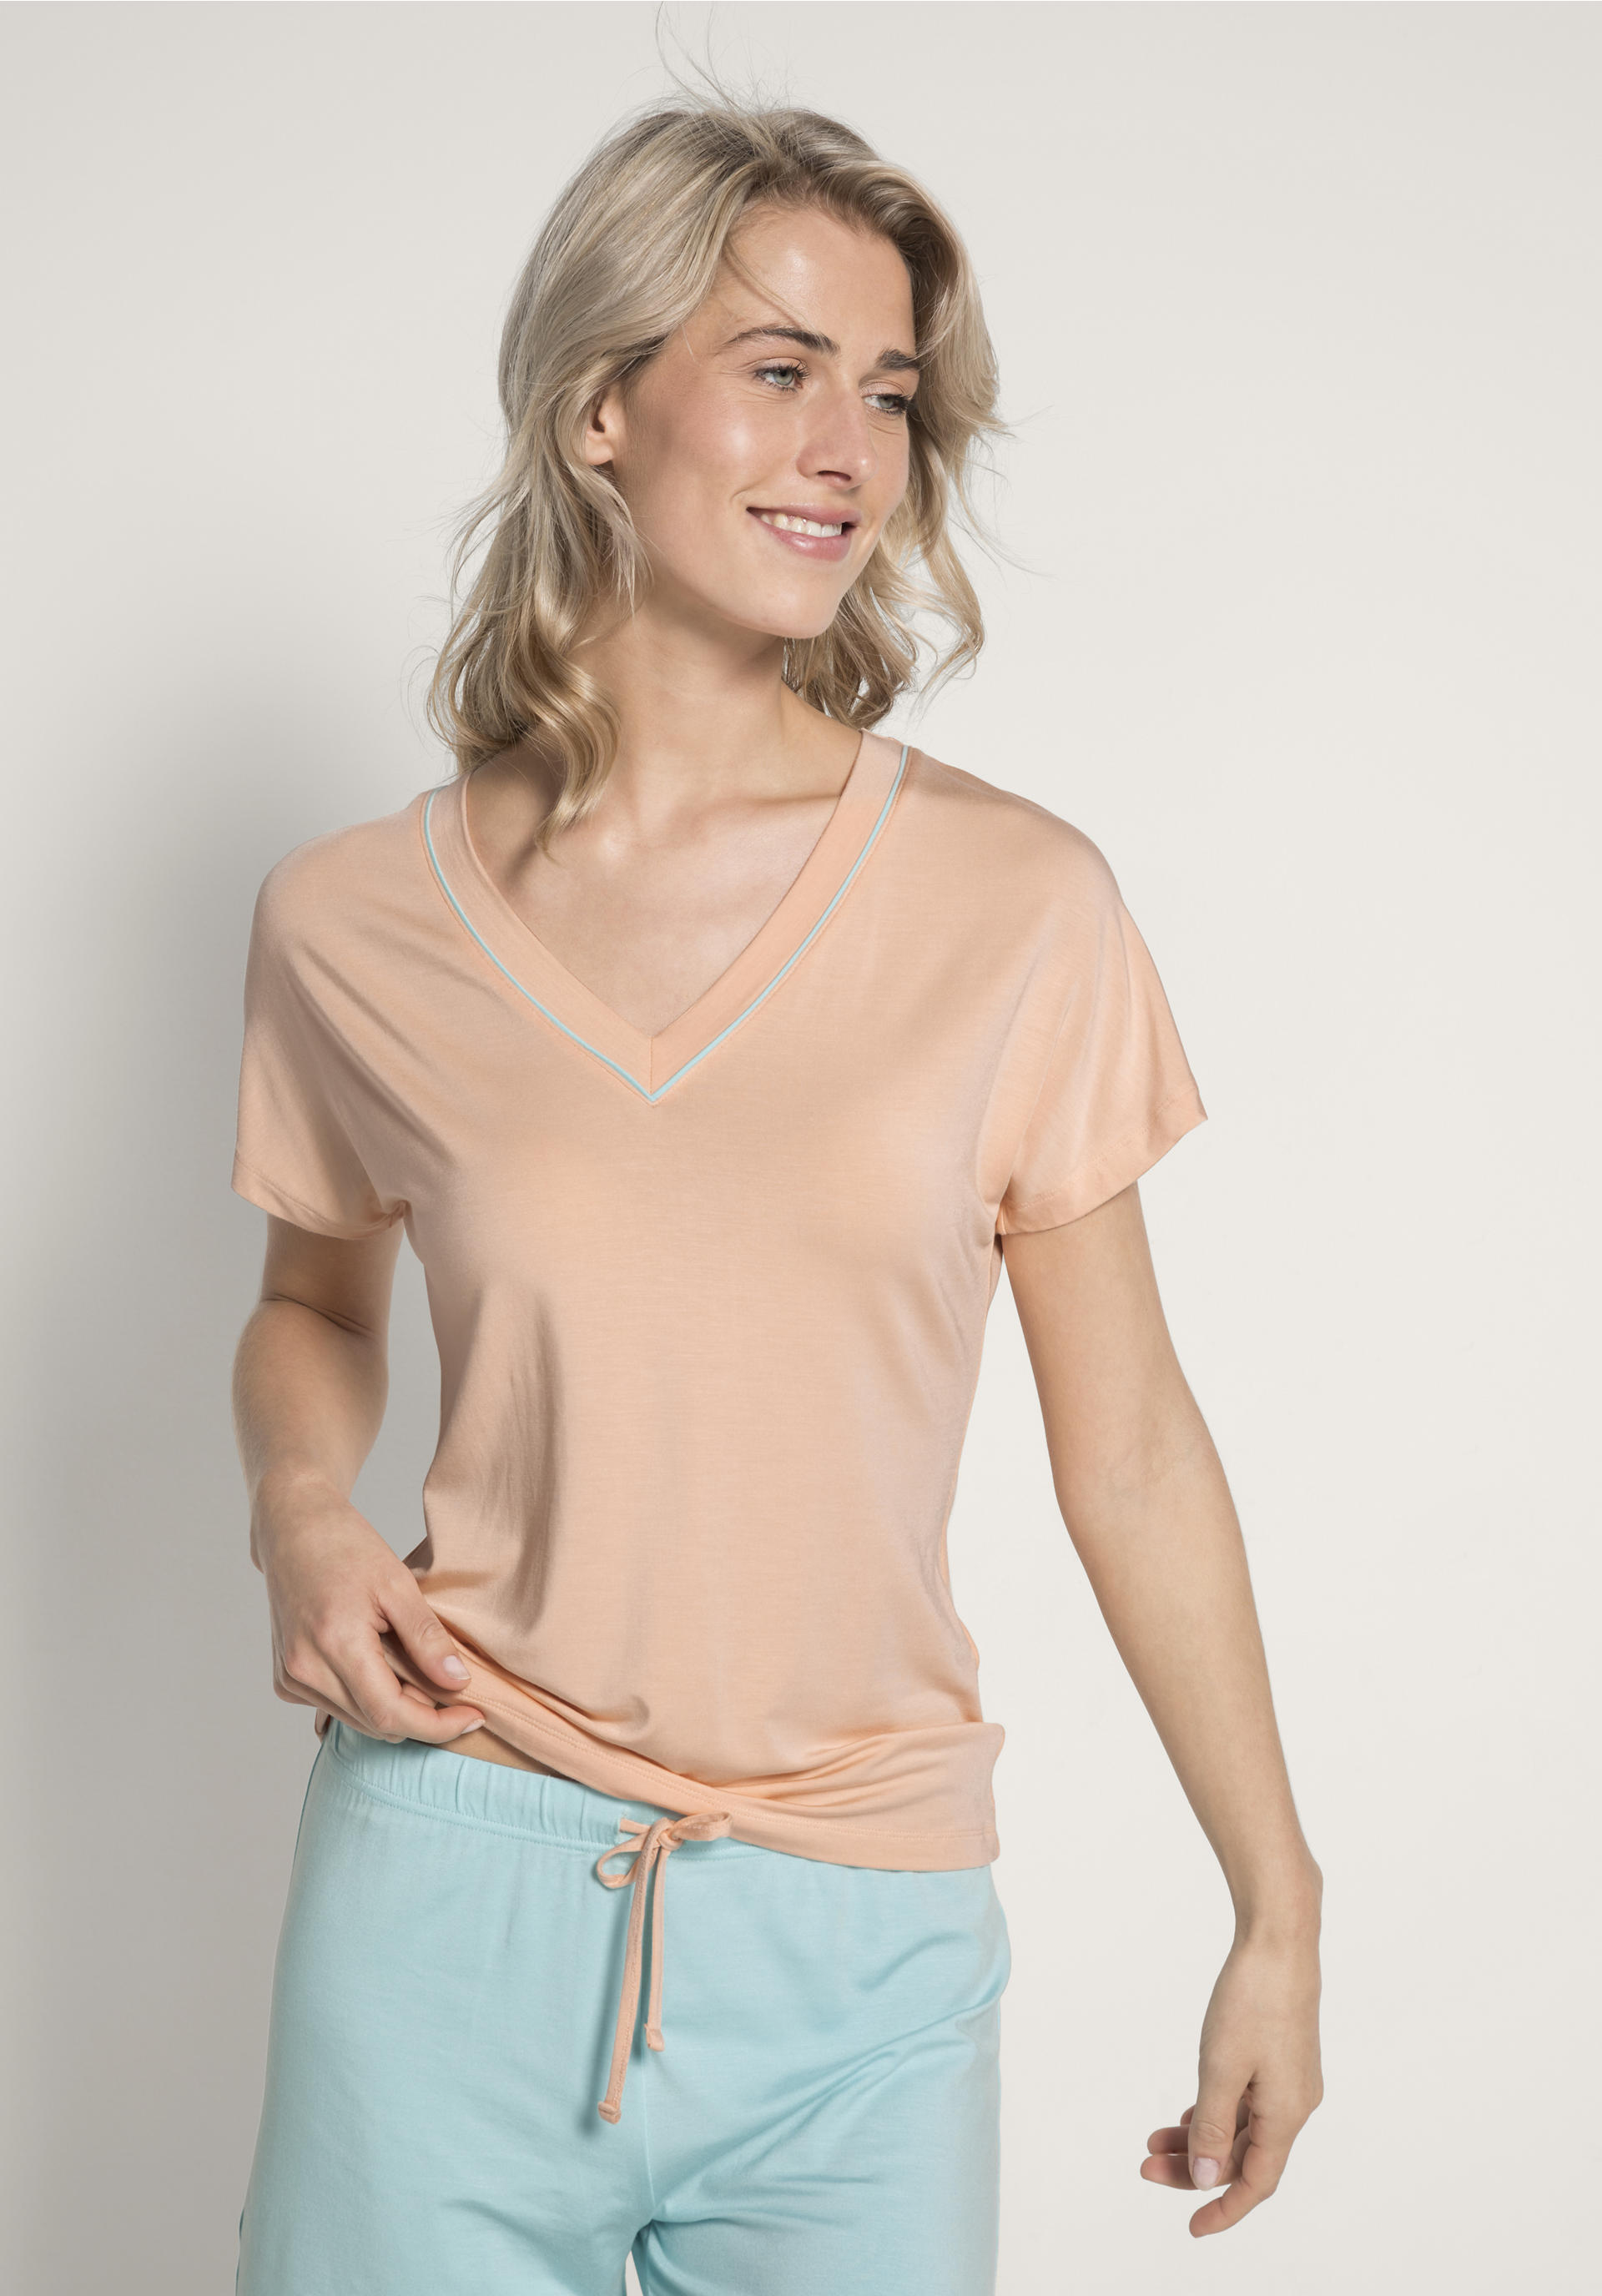 online store 92eaf 65d62 Damen Schlafshirt aus Modal von hessnatur